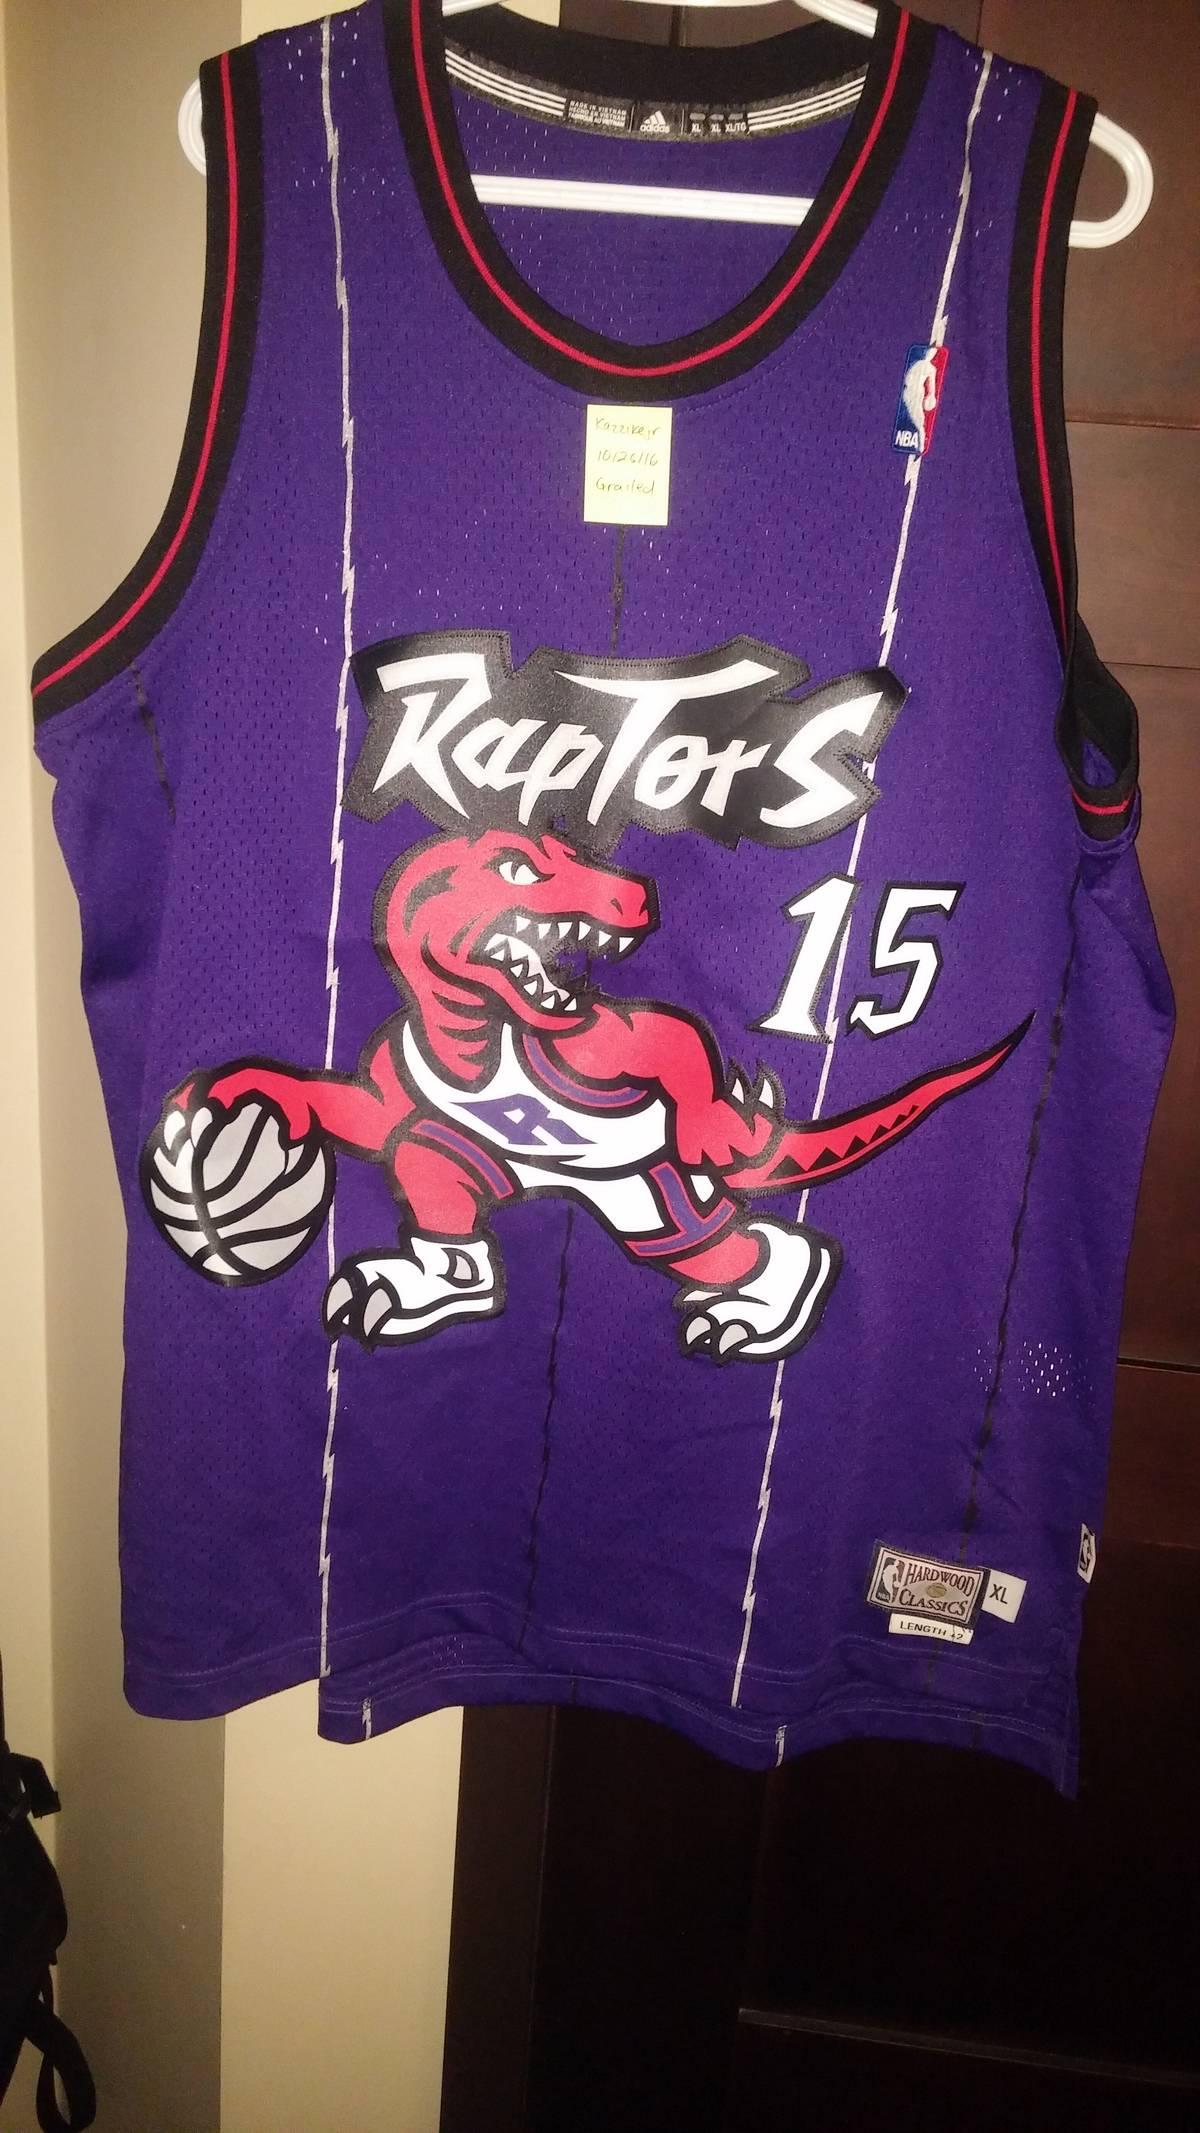 5a3755ce6 Adidas Toronto Raptors Vince Carter adidas Purple Hardwood Classics  Swingman Jersey Size xxl - Jerseys for Sale - Grailed